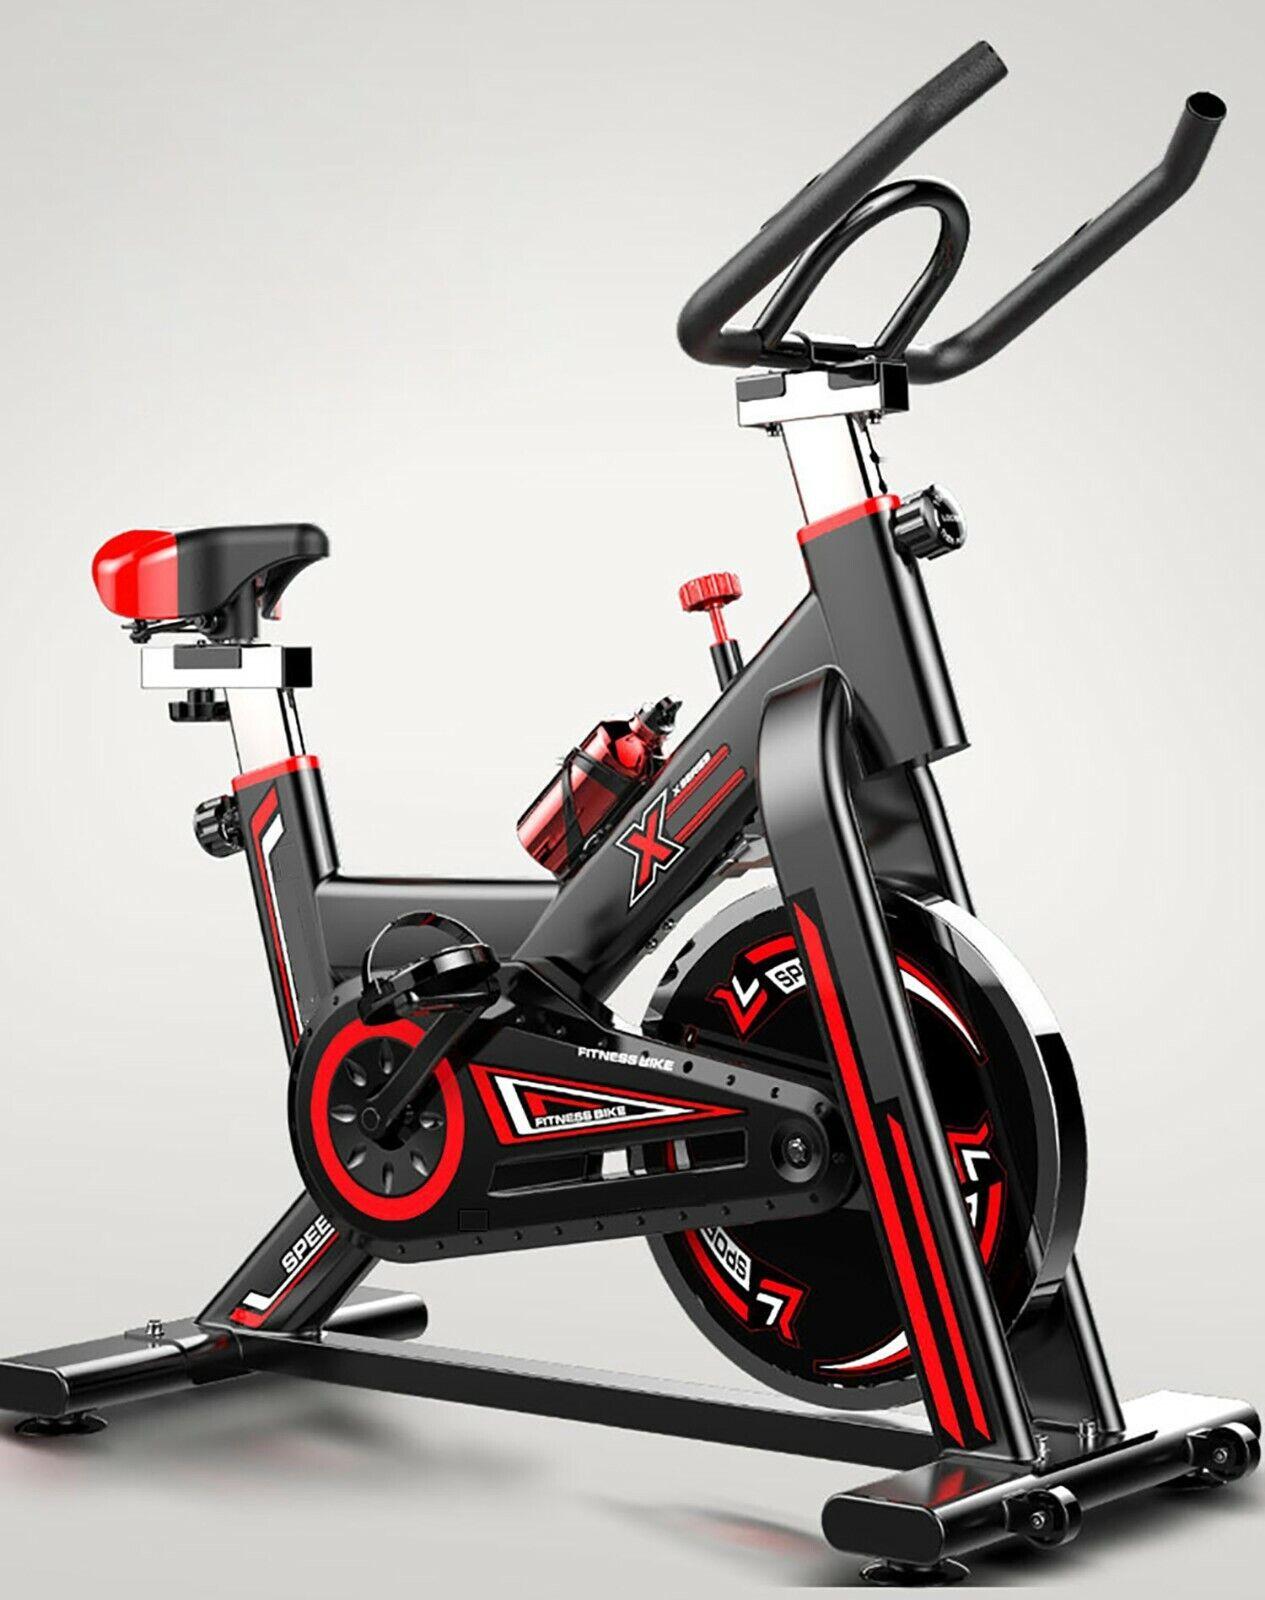 Bicicletta Daspinning indoor regolabile display LCD volante inerzia 16kg GOSPORT